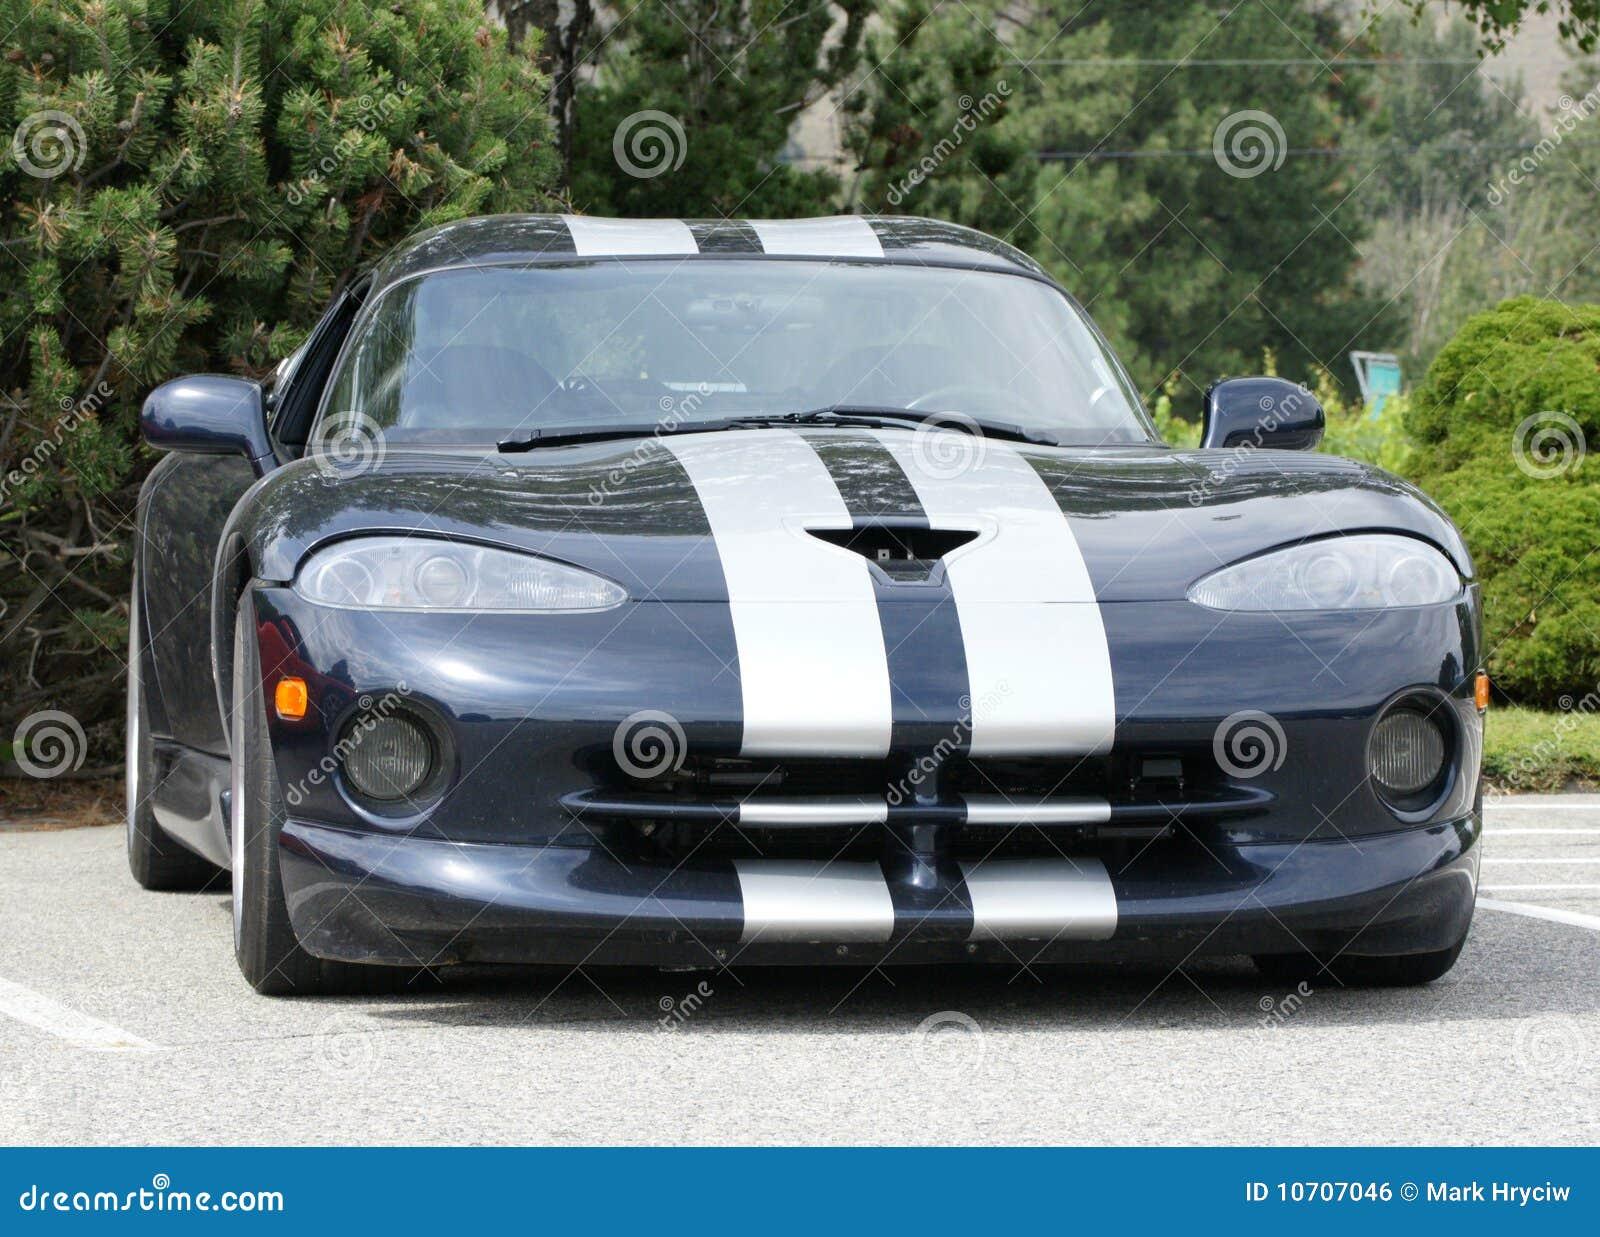 Dodge Viper Black stock photo. Image of headlights, front - 10707046